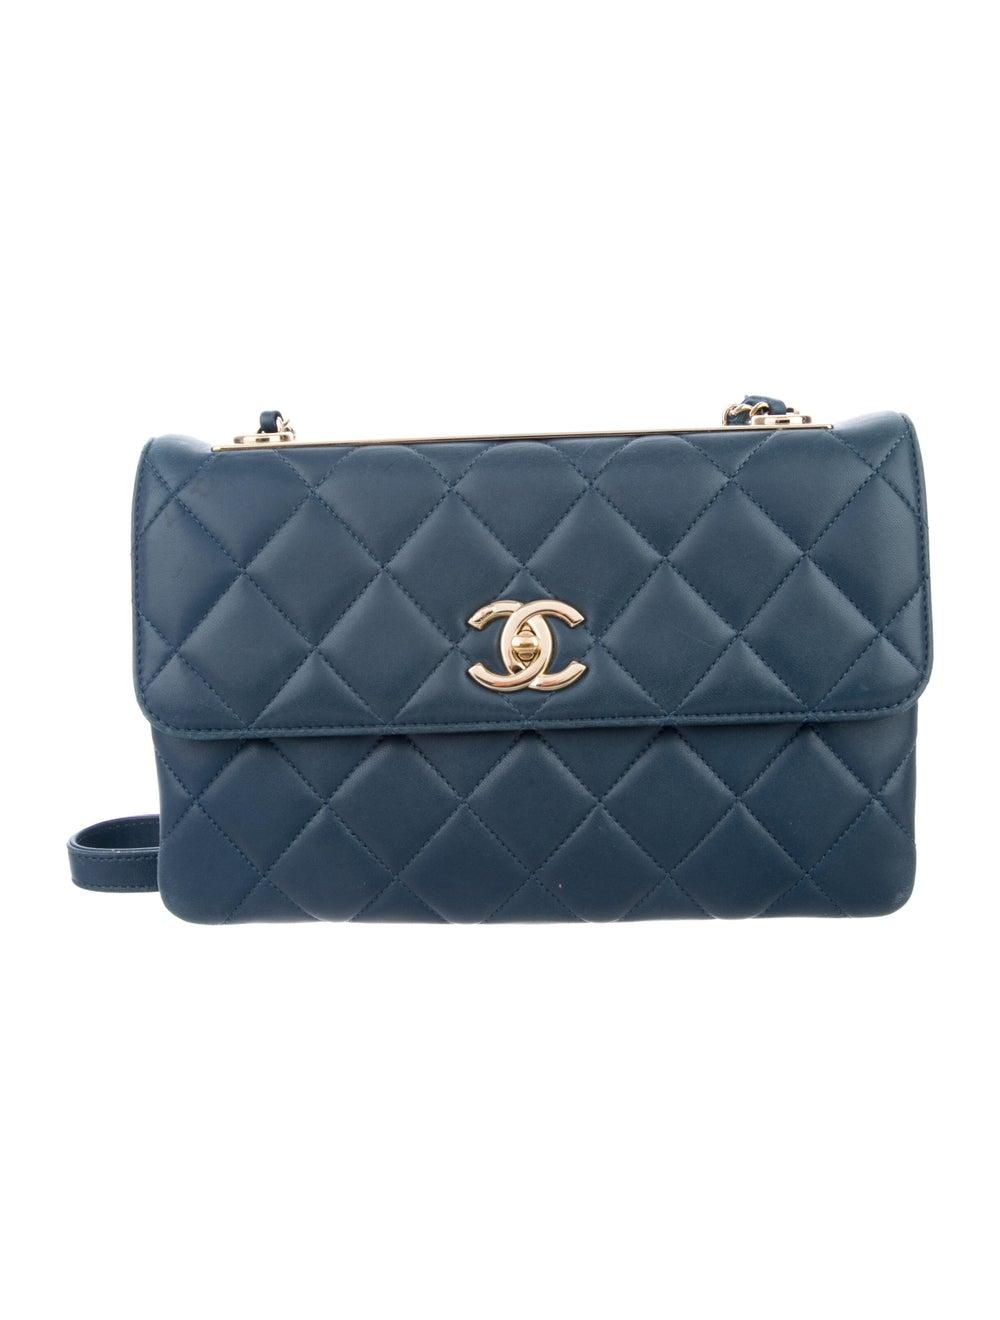 Chanel Trendy CC Flap Bag Blue - image 1